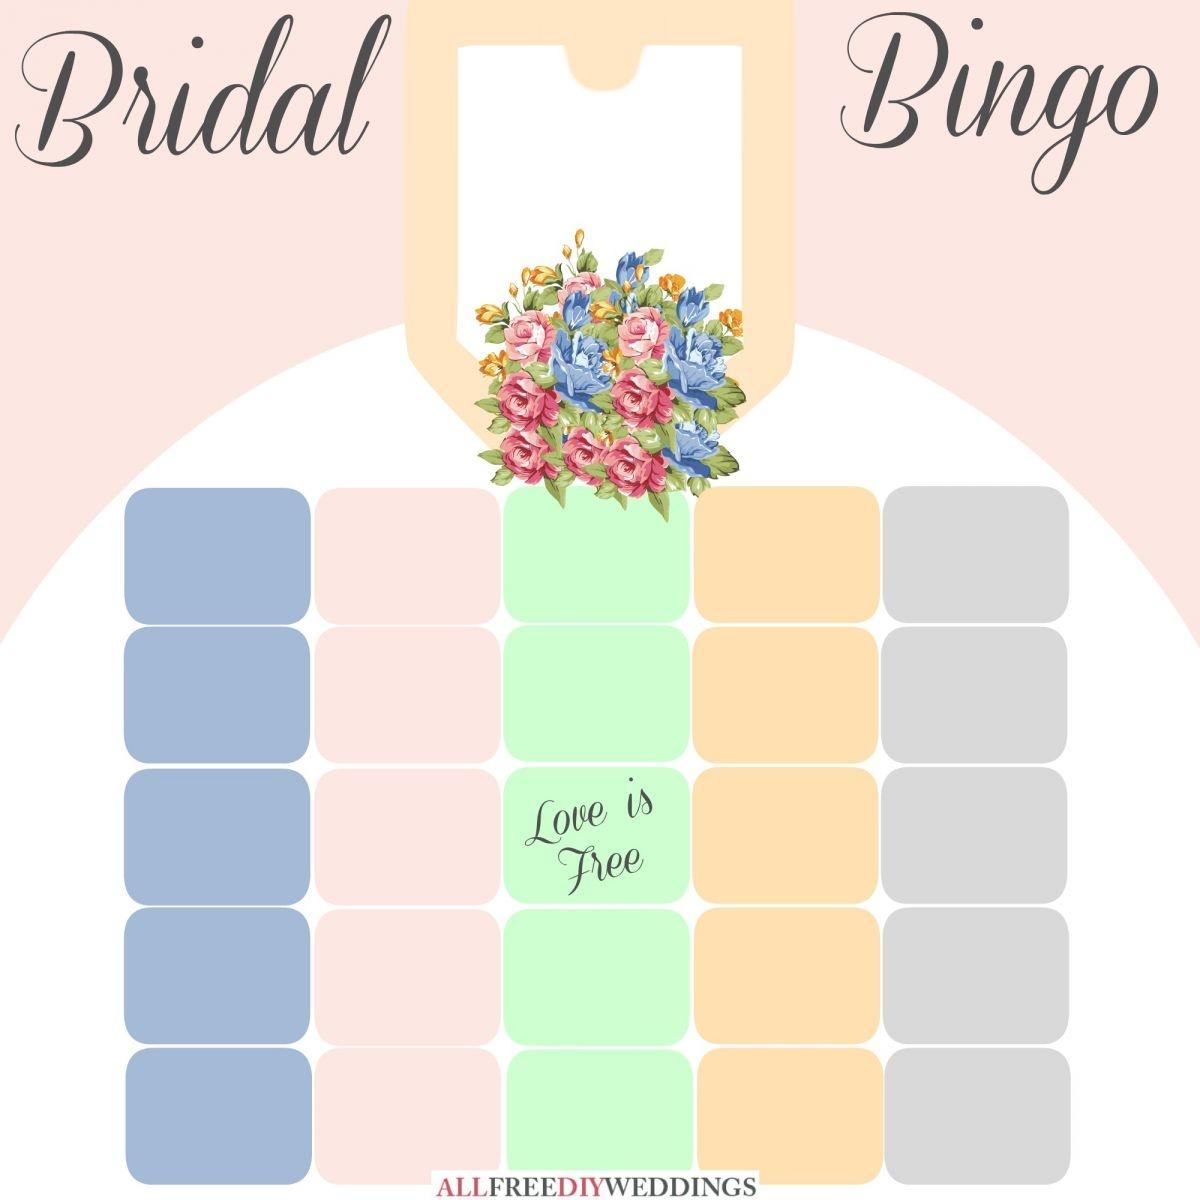 New Bridal Bingo: Free Bridal Shower Games | Allfreediyweddings - Free Printable Bridal Shower Blank Bingo Games